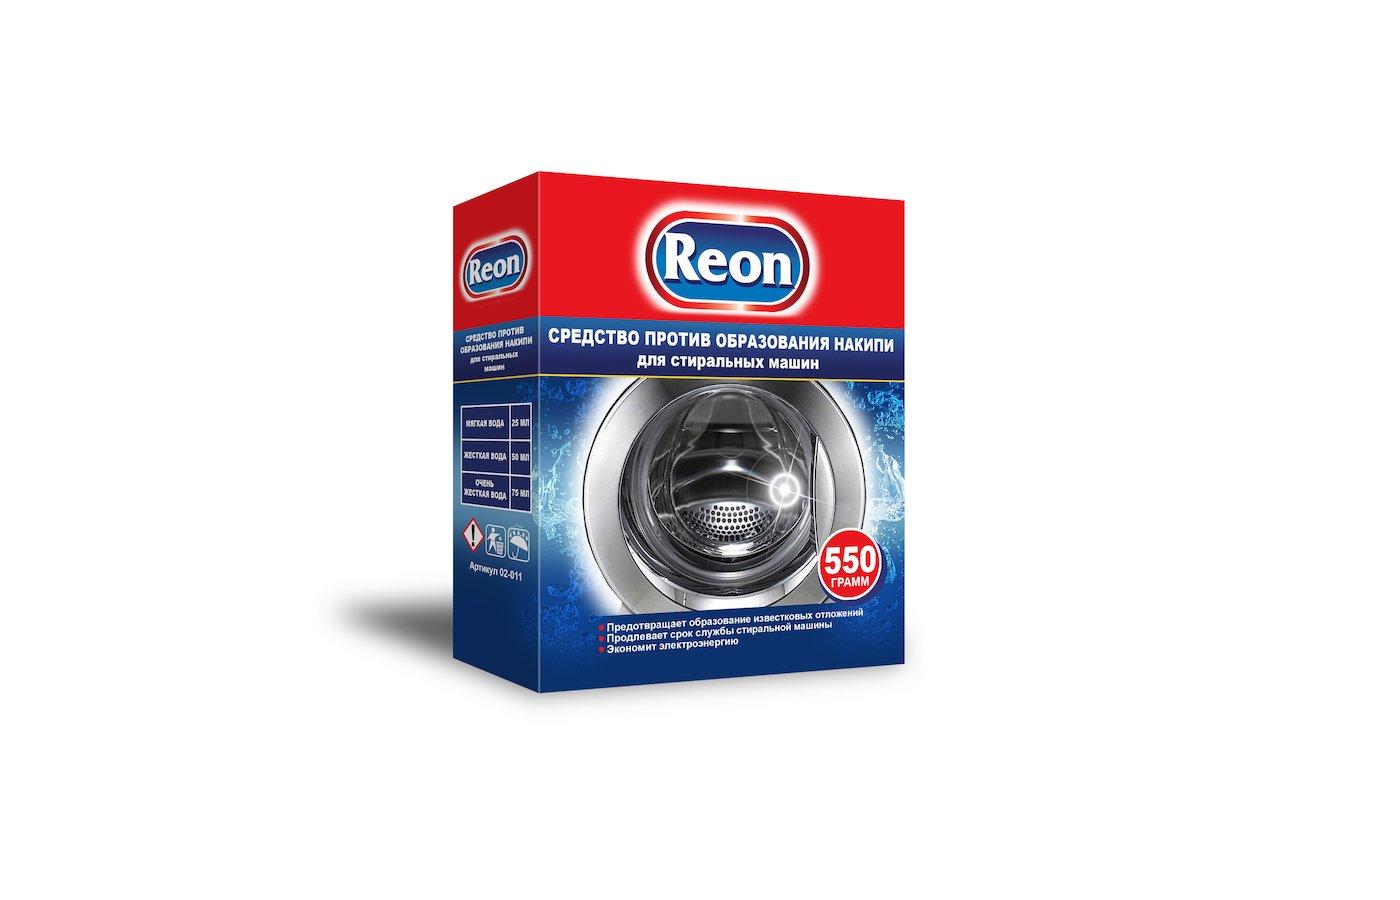 Средства для стирки и от накипи Reon 02-011 Средство против накипи для стиральных машин